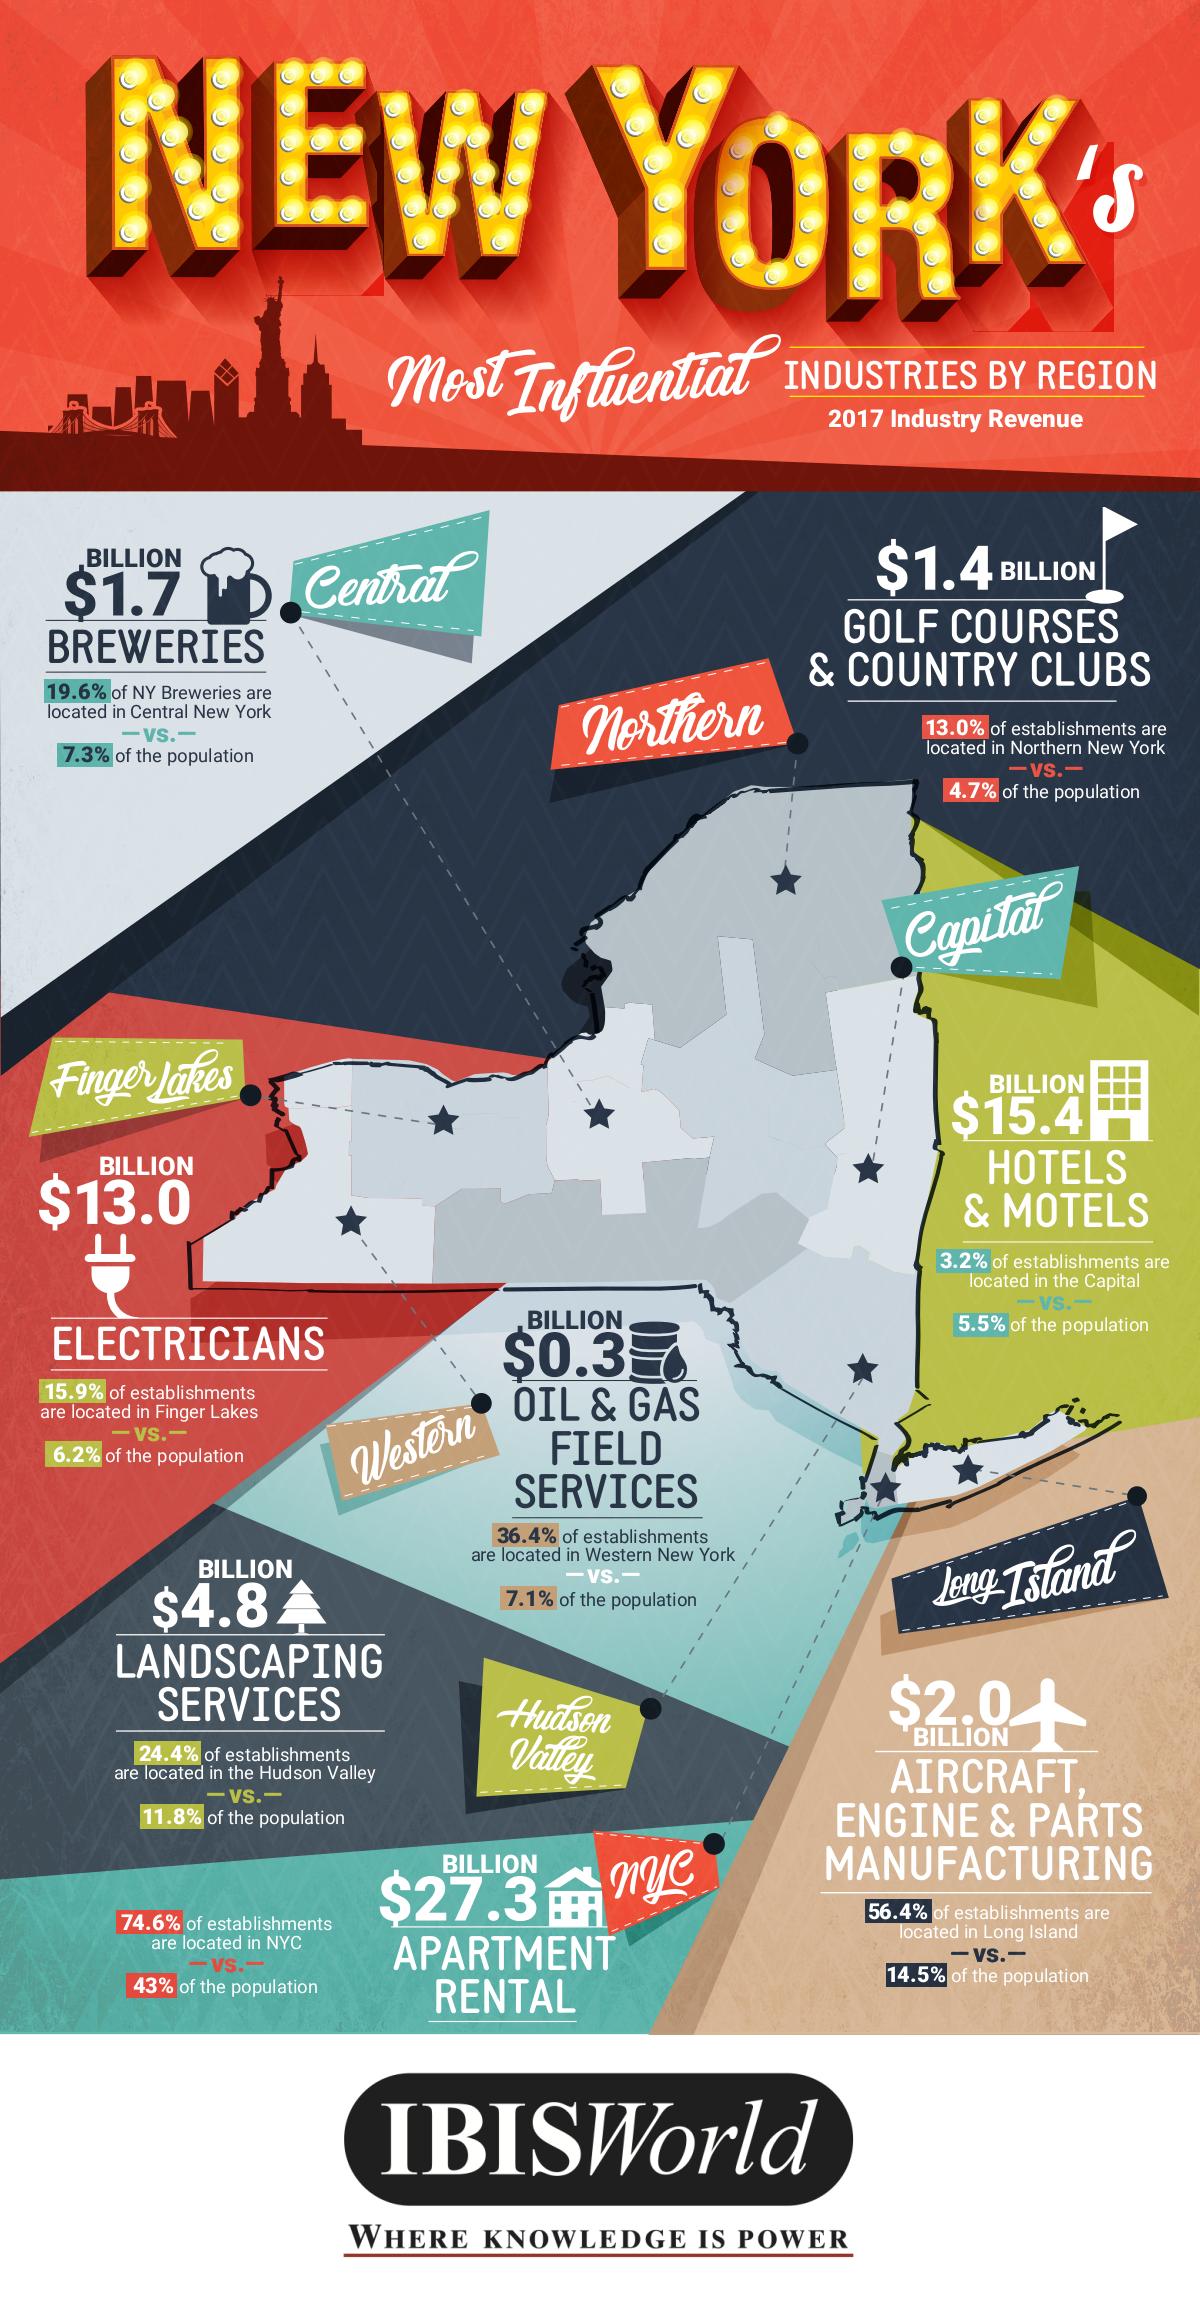 Top New York Industries by Region